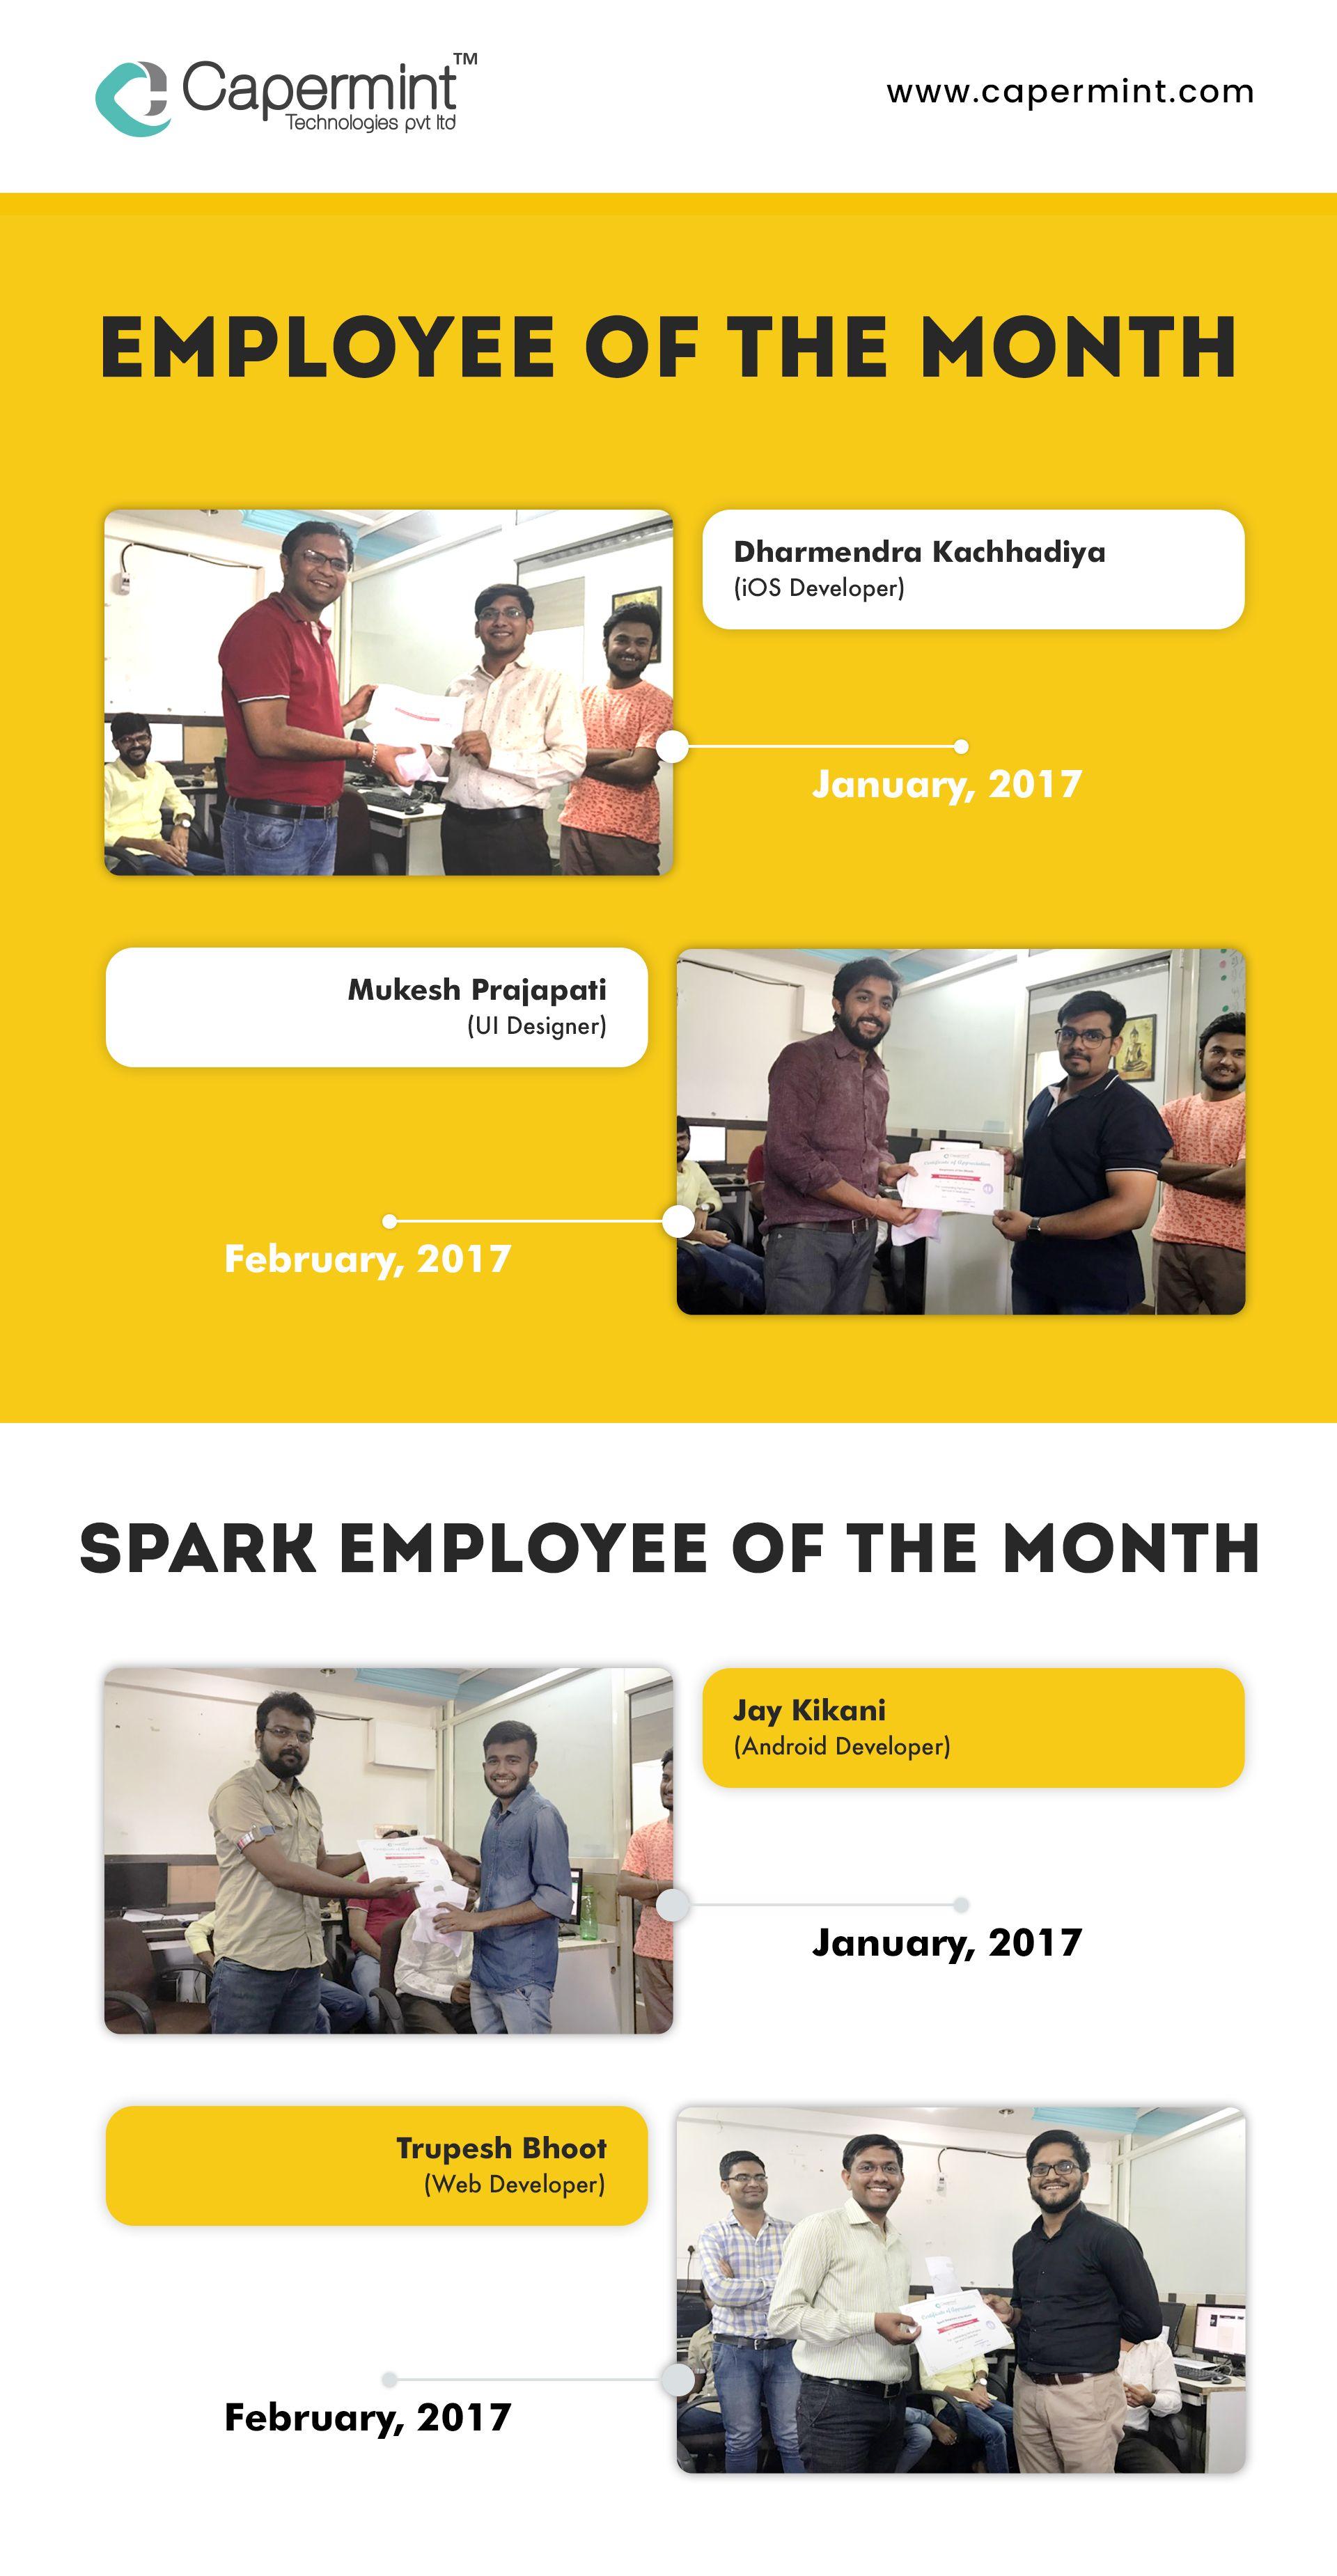 Congratulations to Award Winners of EmployeeoftheMonth